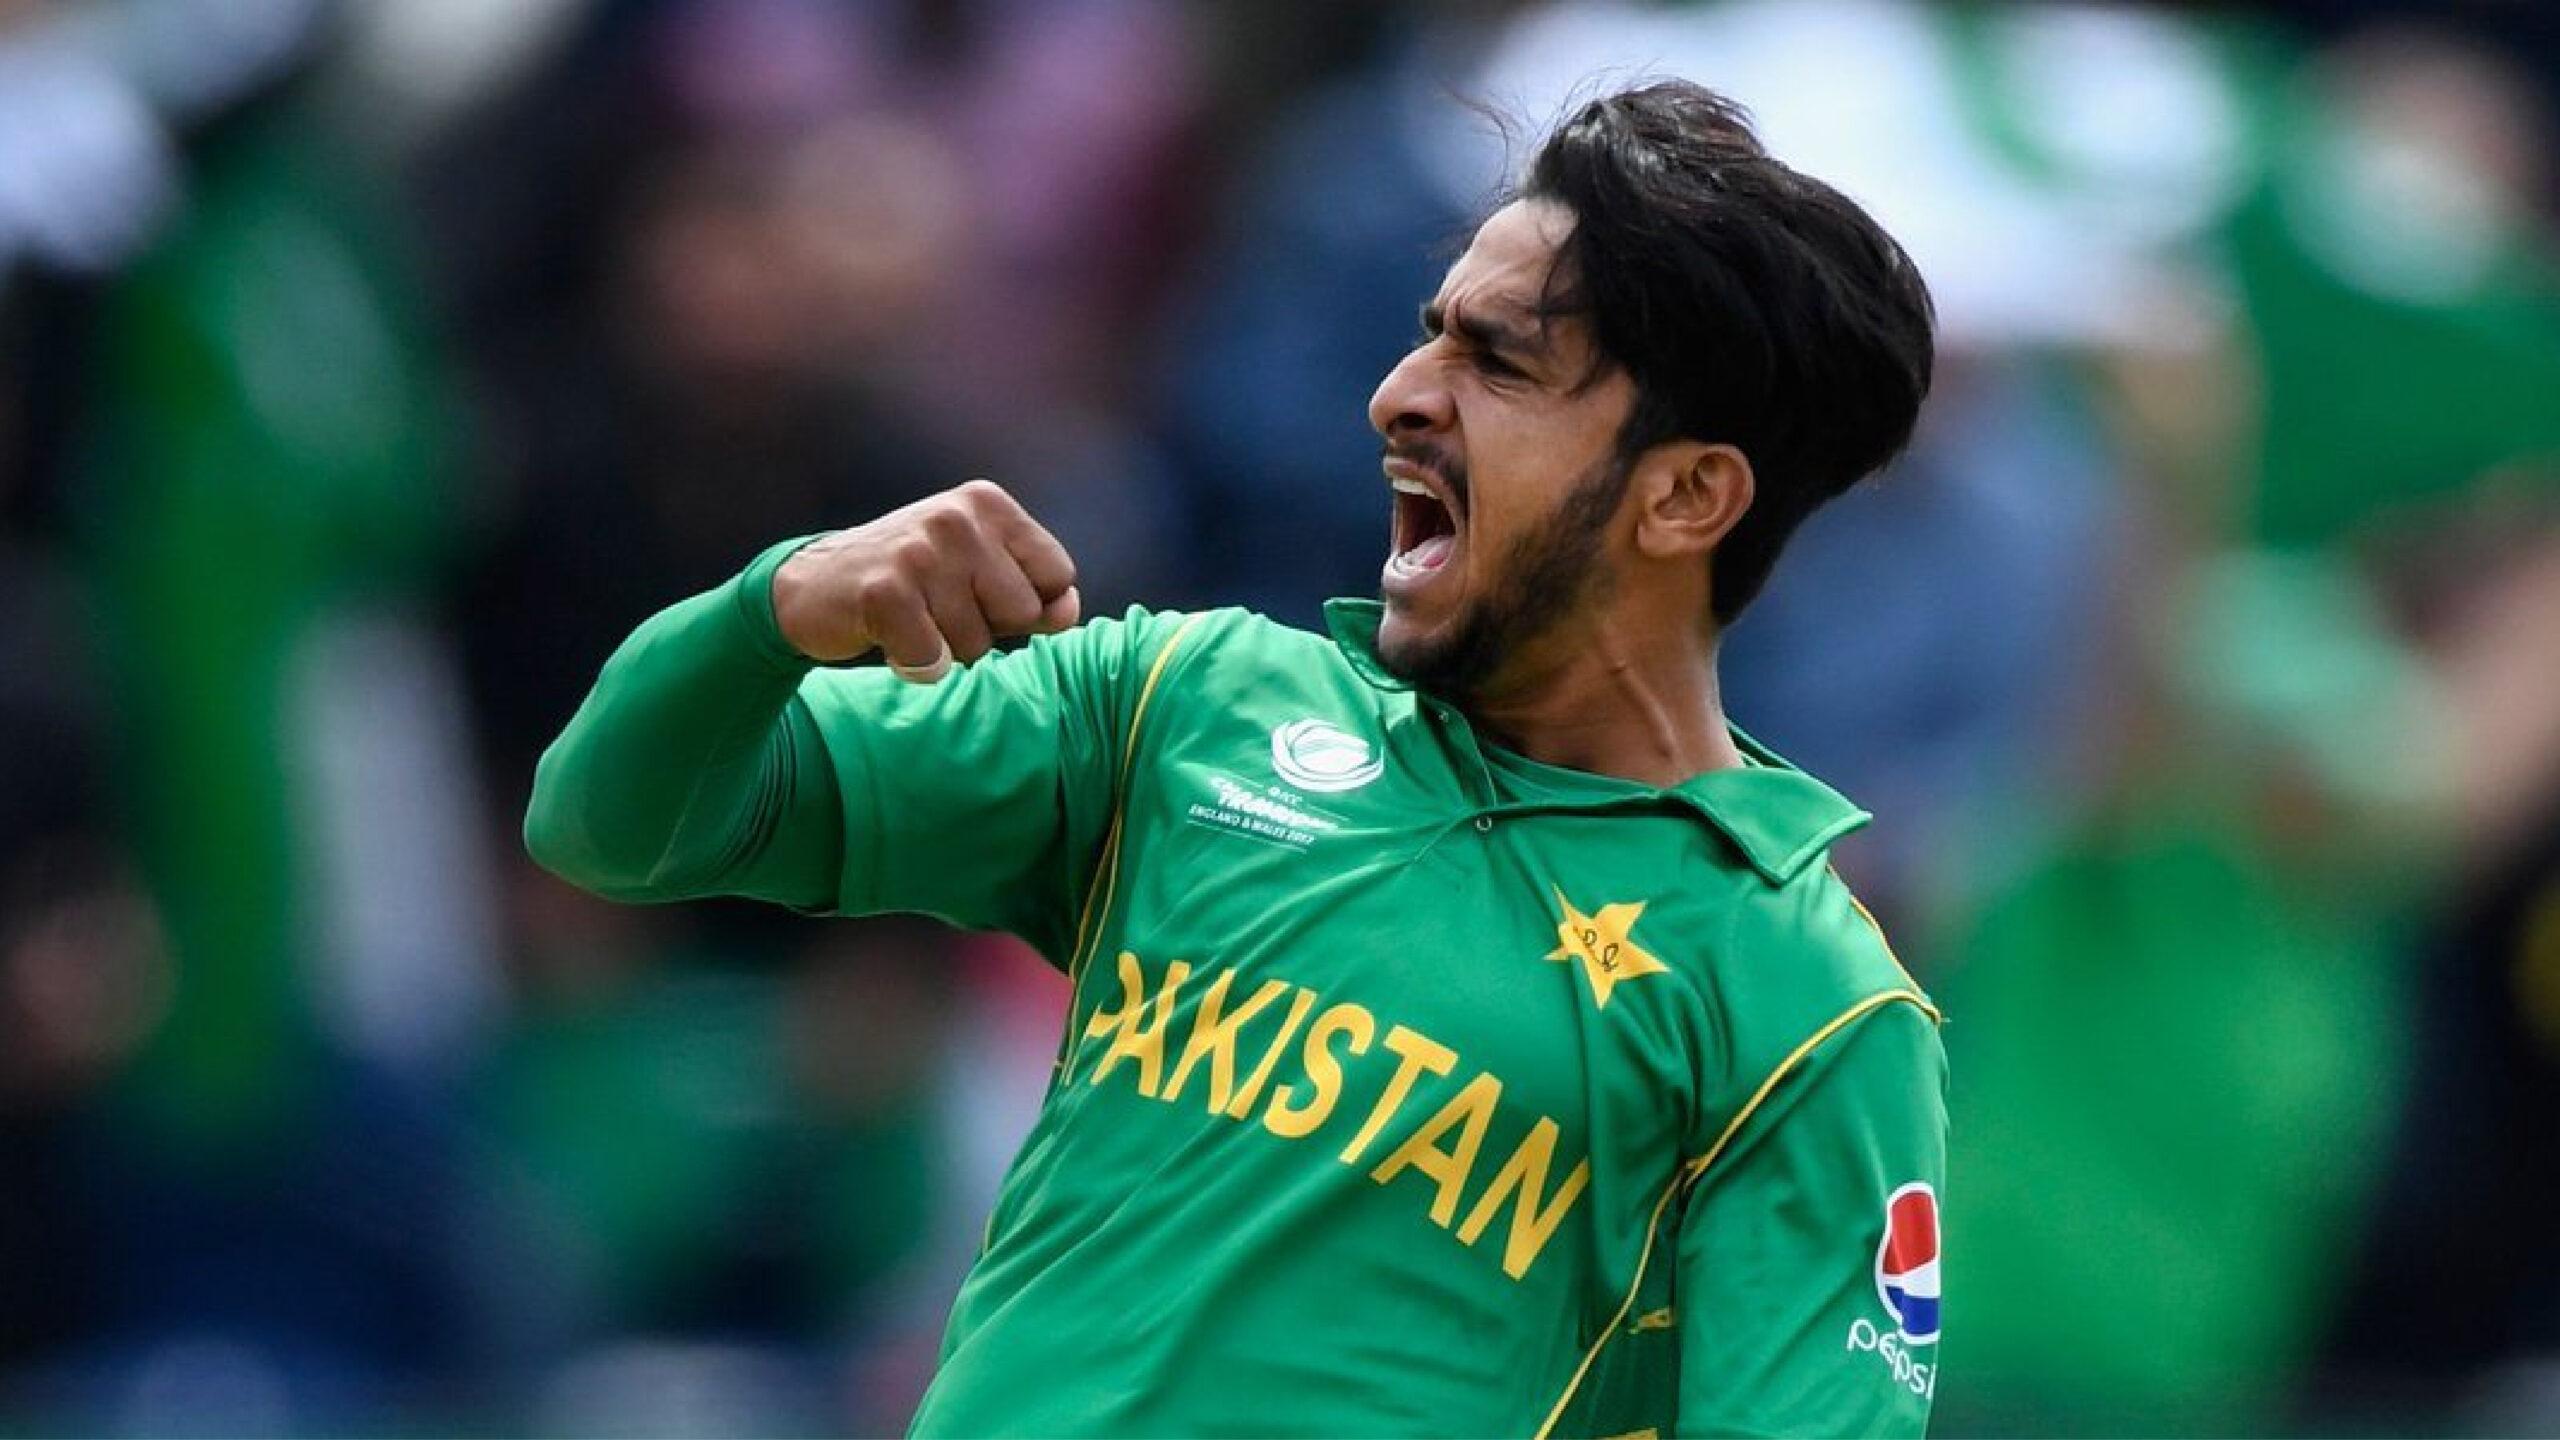 Pakistan cricketer Hasan Ali grabs the top spot is leading wicket taker's list